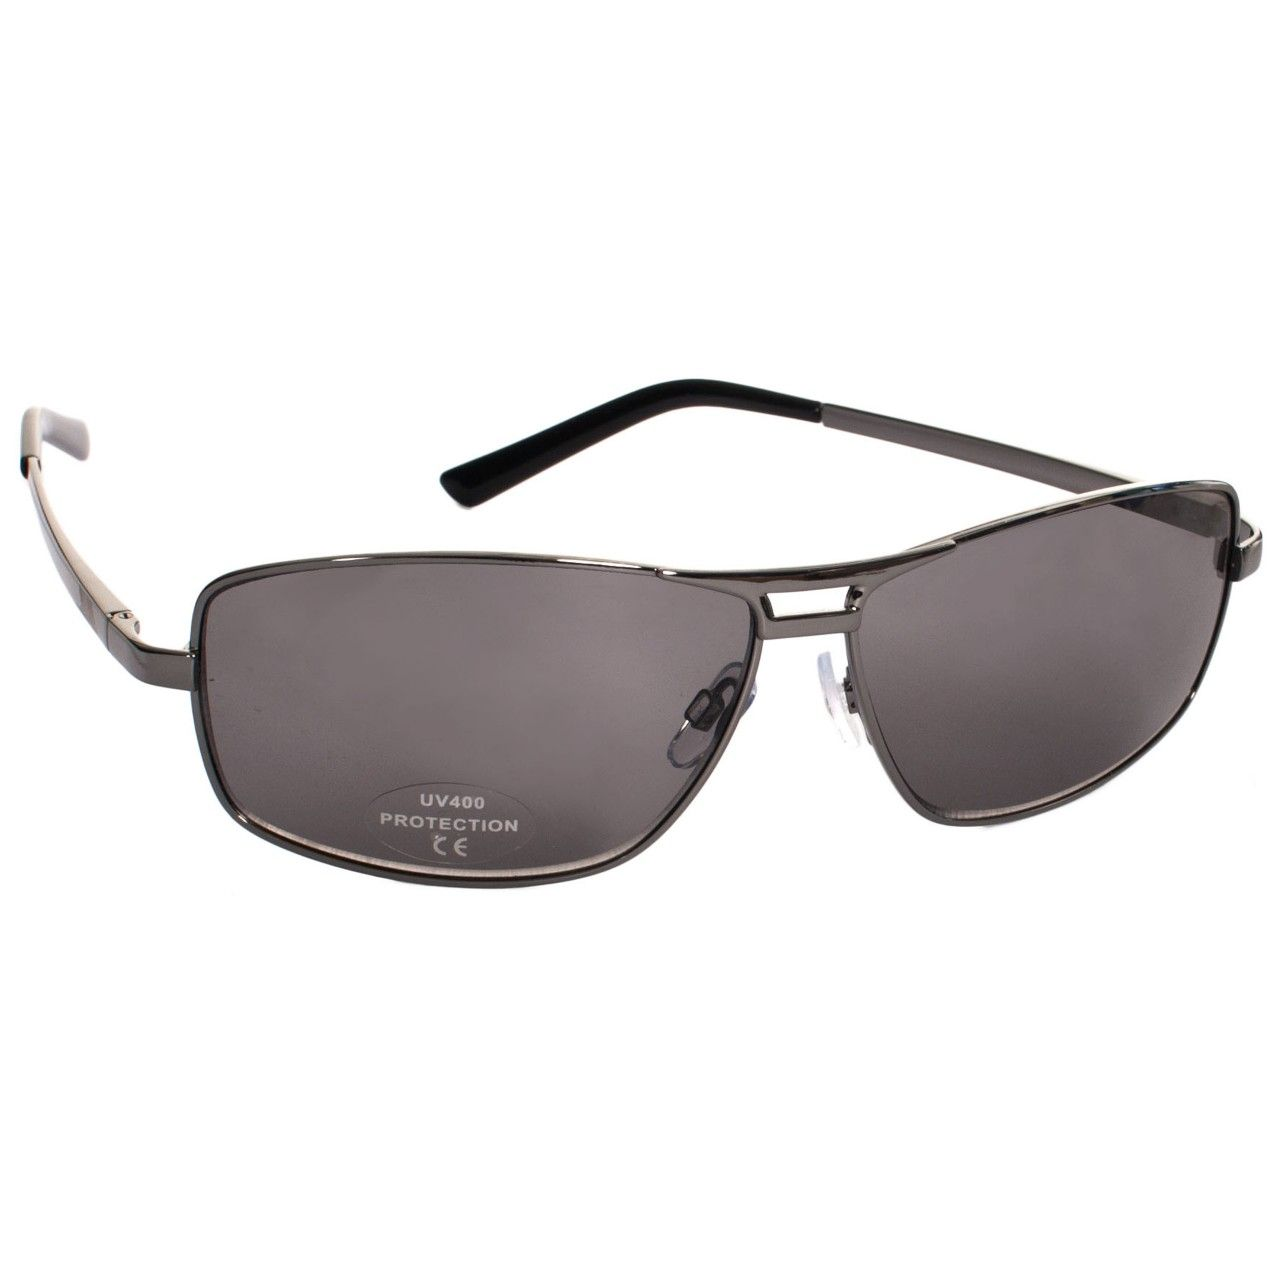 Trespass Adults Unisex Enforcement Tinted Sunglasses